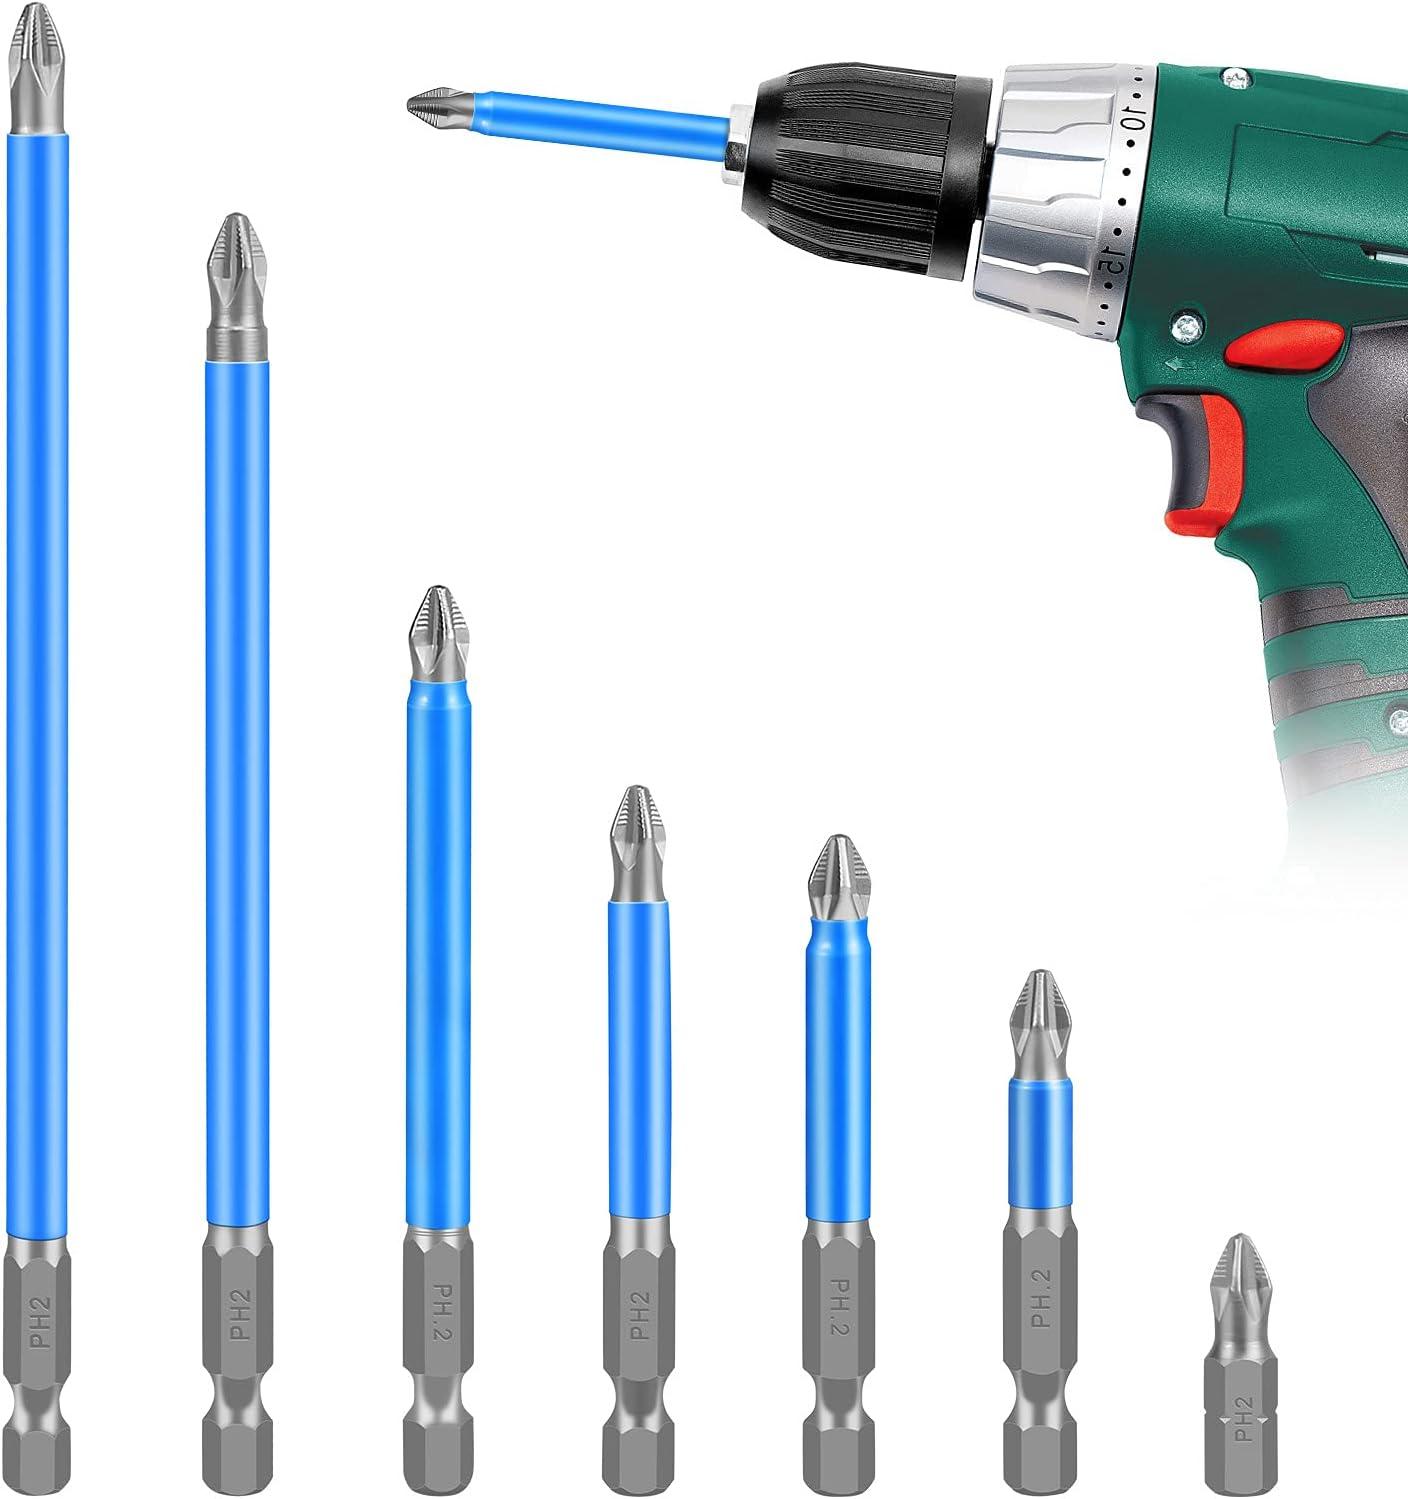 Magnetic Special Campaign Anti-Slip Drill Bit 7PCS Se PH2 Phillips Ranking TOP15 Bits